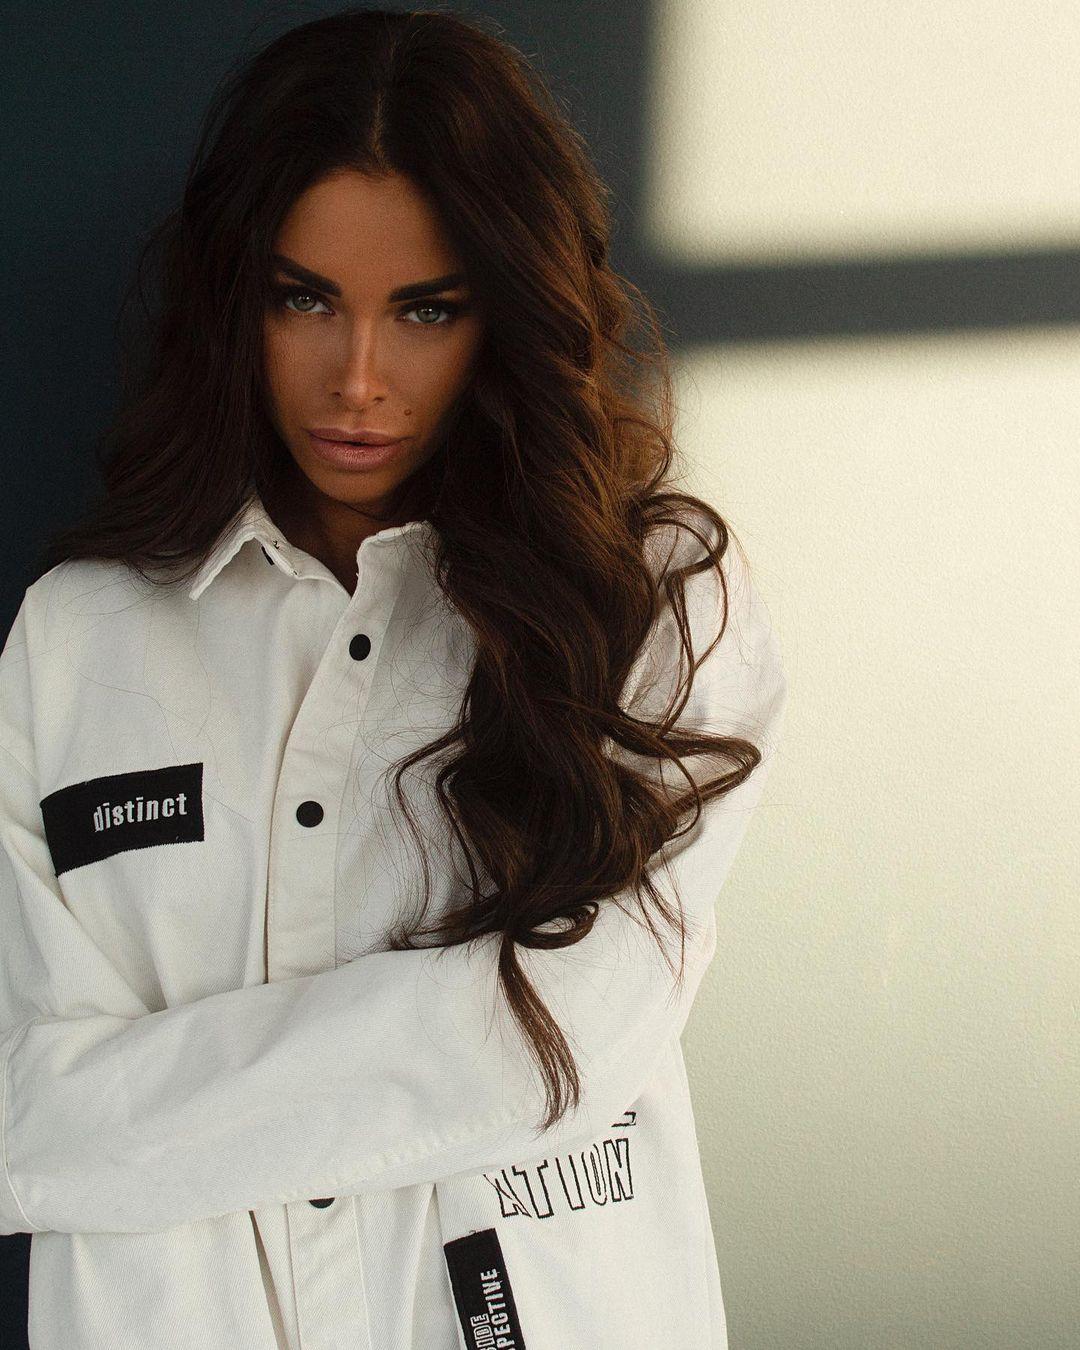 Evgenia-Alex-Wallpapers-Insta-Fit-BIo-2